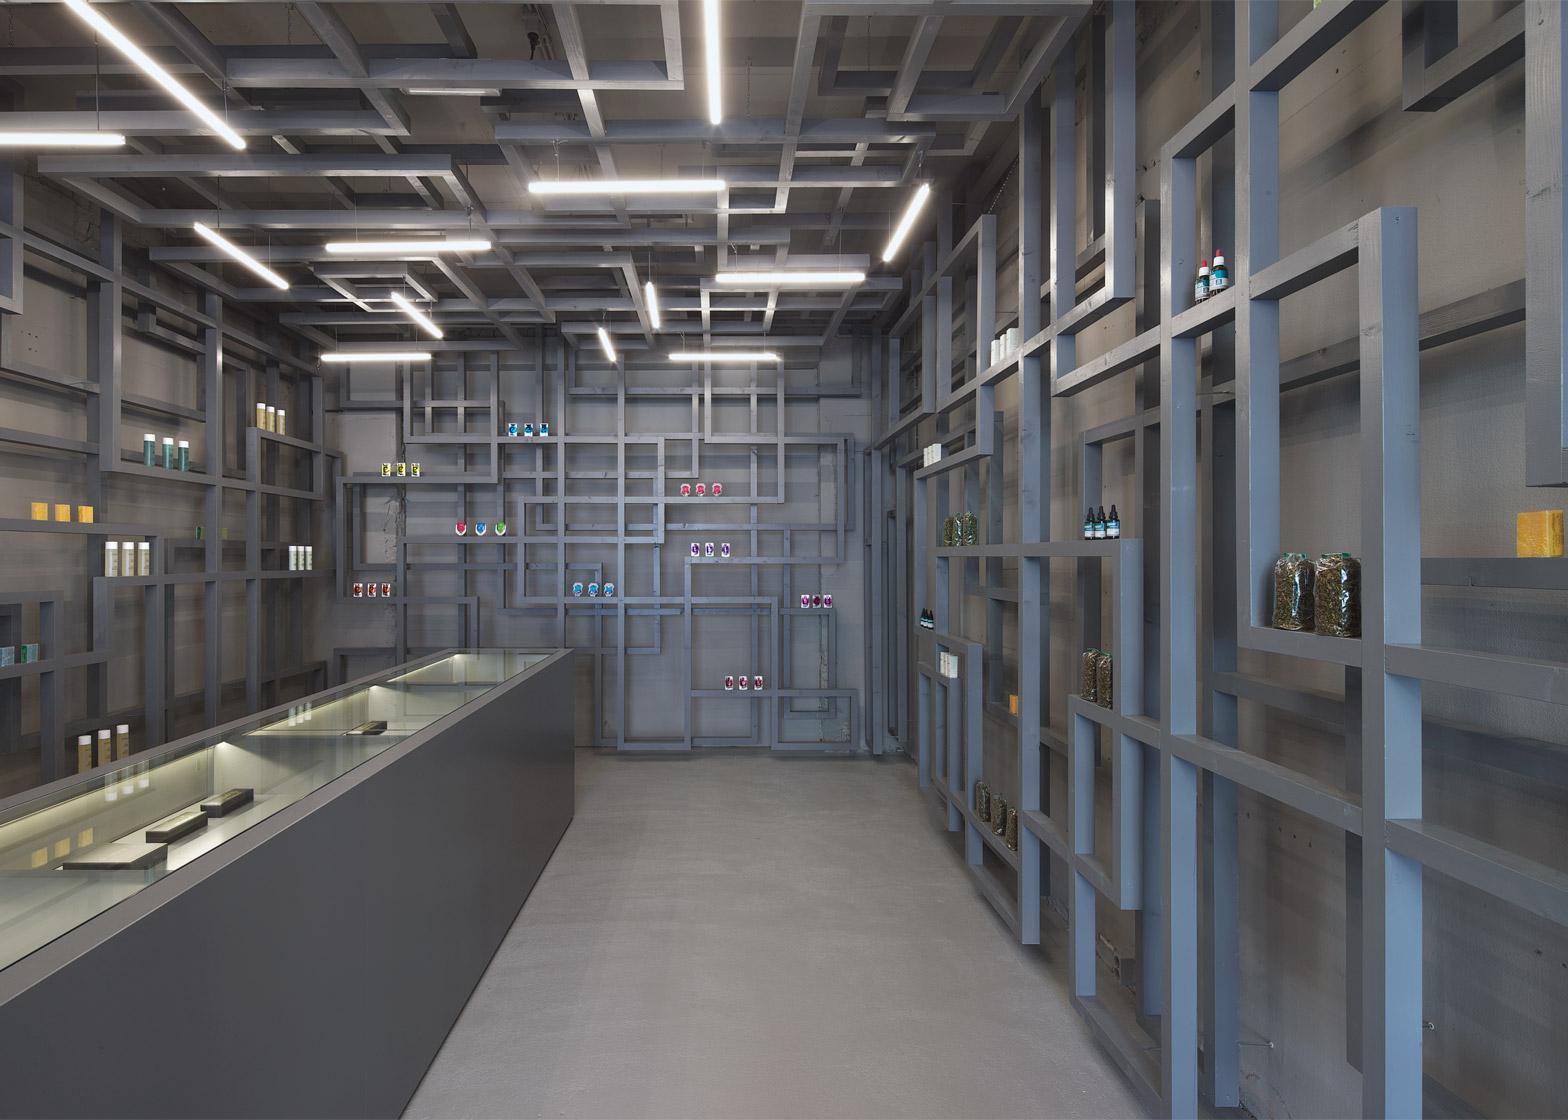 architecture-design-studia-interiors-osnovadesign-osnova-ukraine-poltava-kyev-dnepropetrovsk-kharkov-odessa-lviv-poltava-05